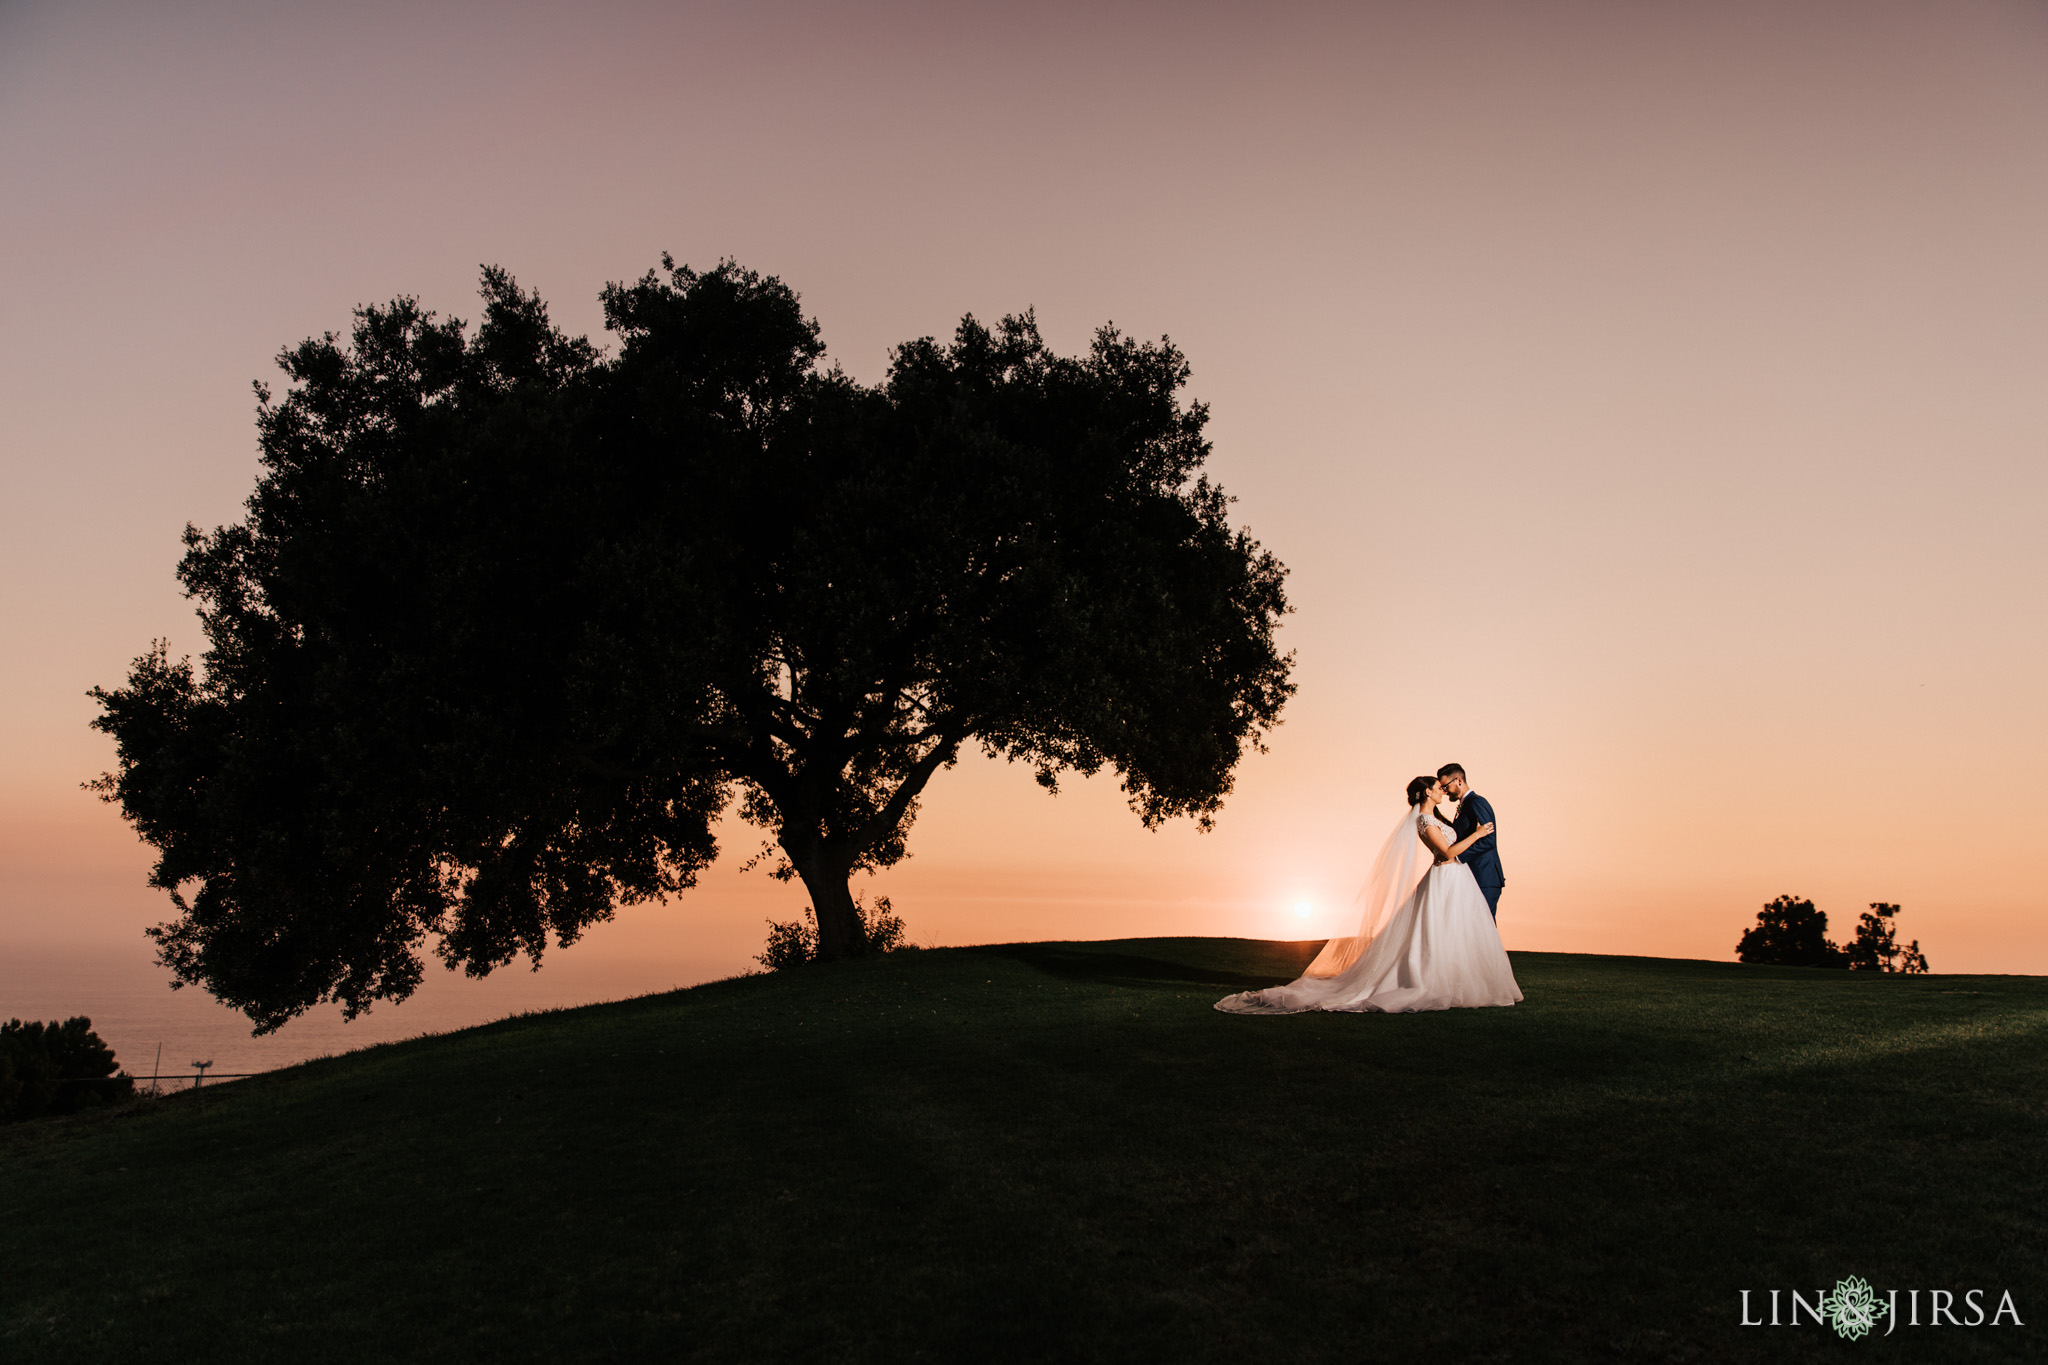 033 los verdes golf course wedding photography